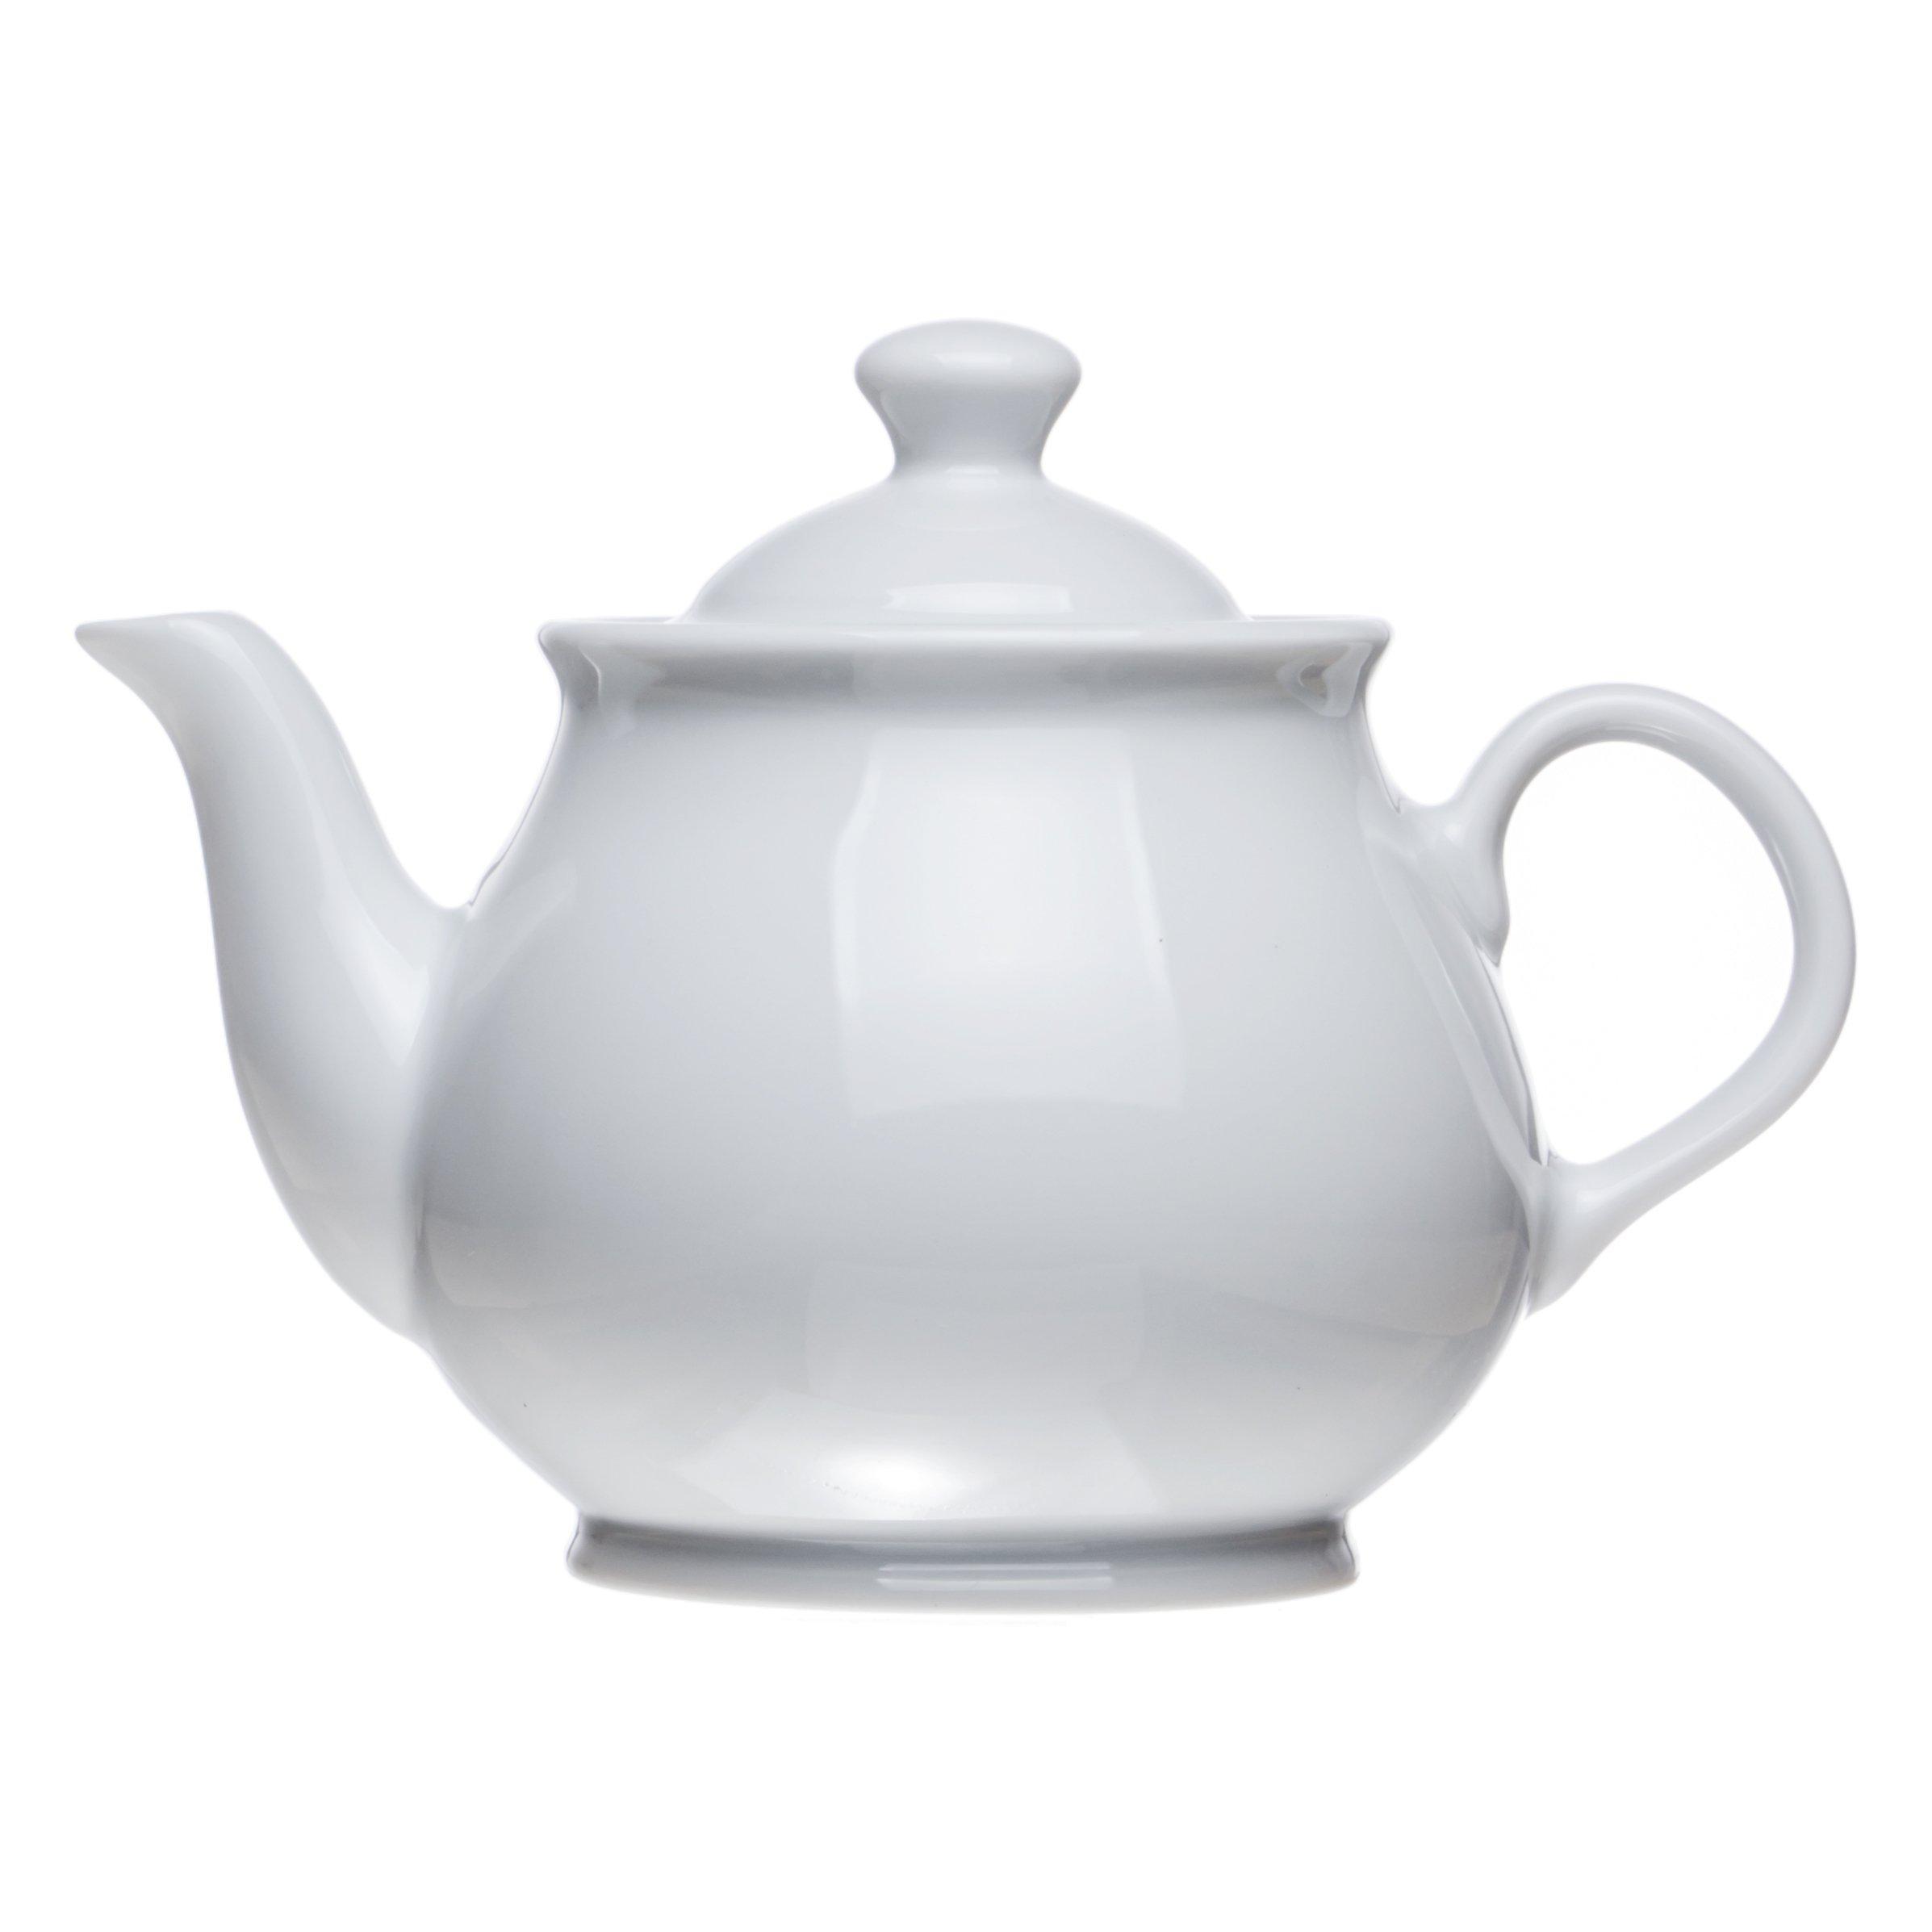 Classic White Porcelain TEAPOT (3 Size), Restaurant&Hotel Quality (20.2 oz)